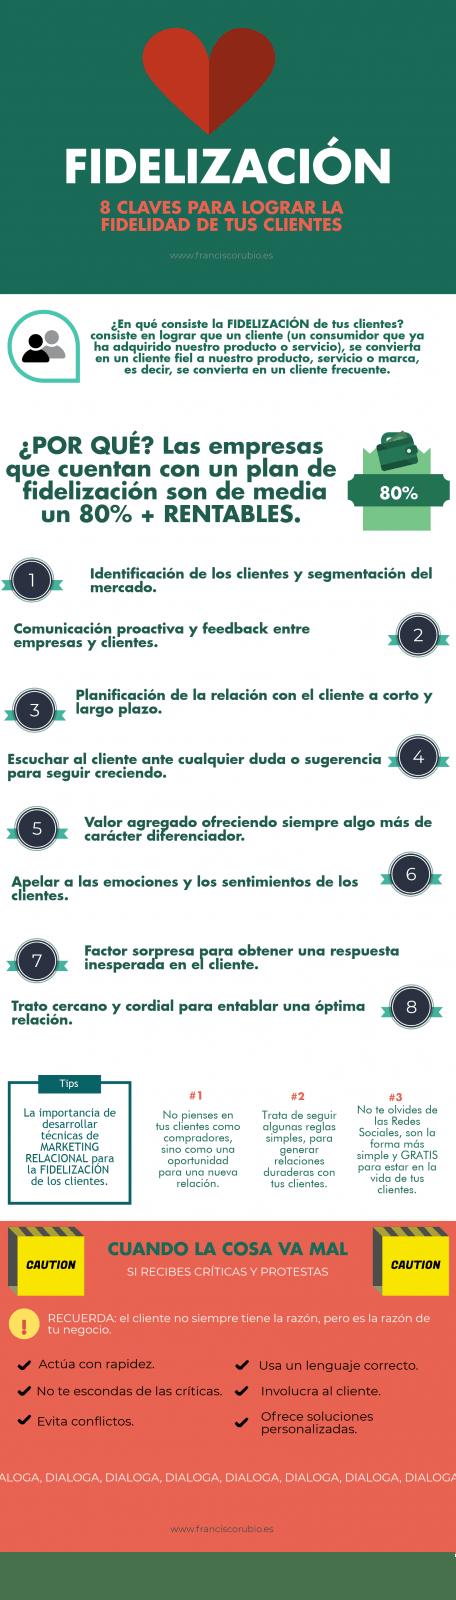 8 claves para fidelizar clientes